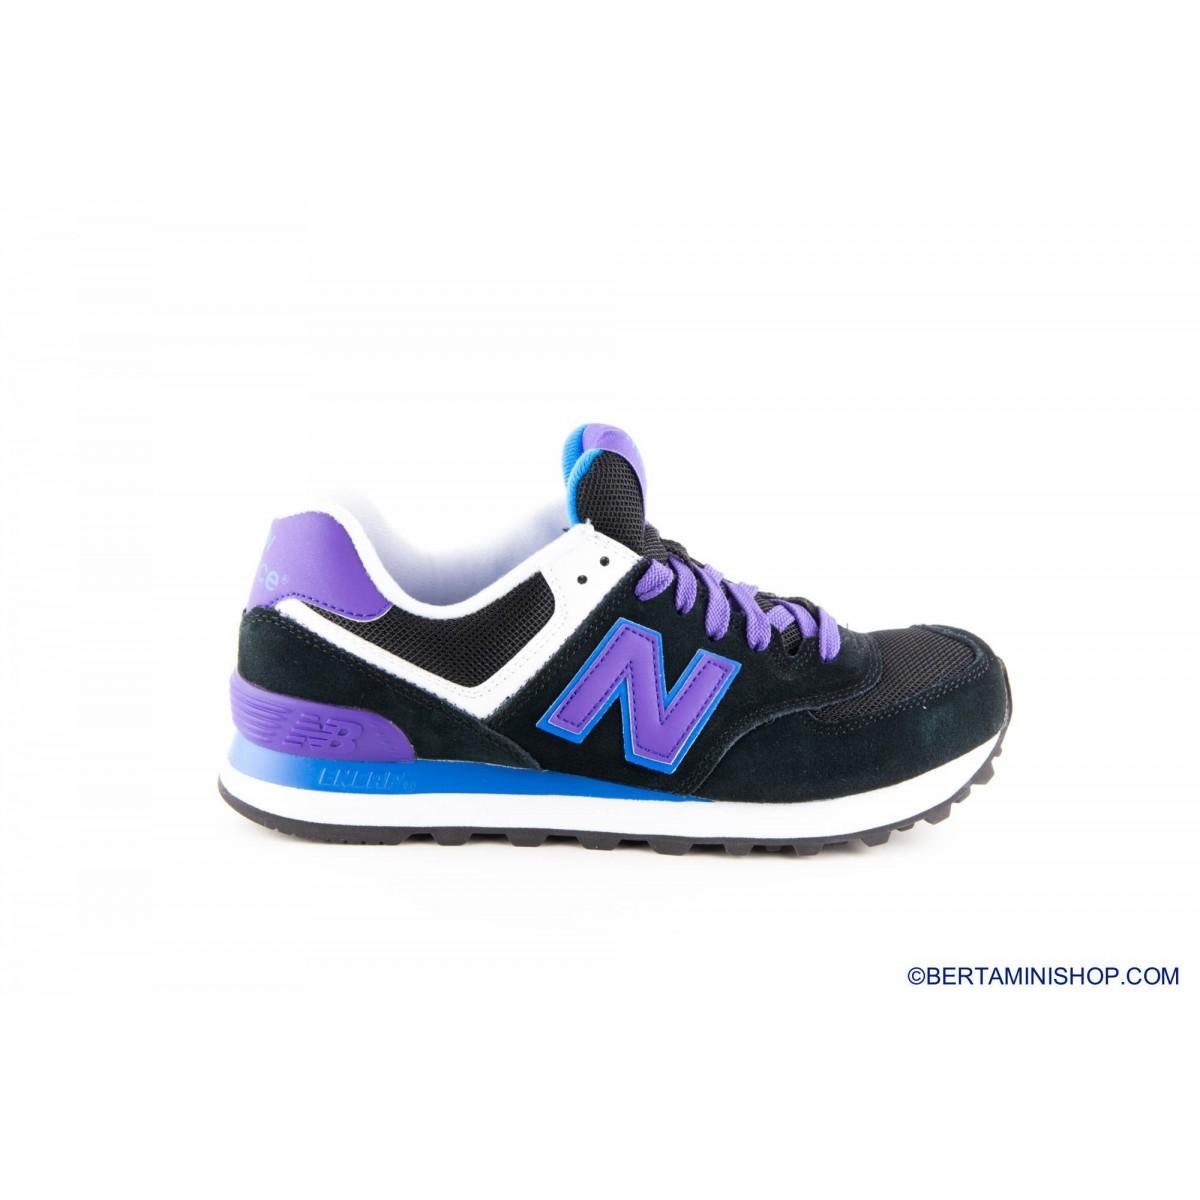 Schuhe New Balance - WL 574 MOX - nera viola